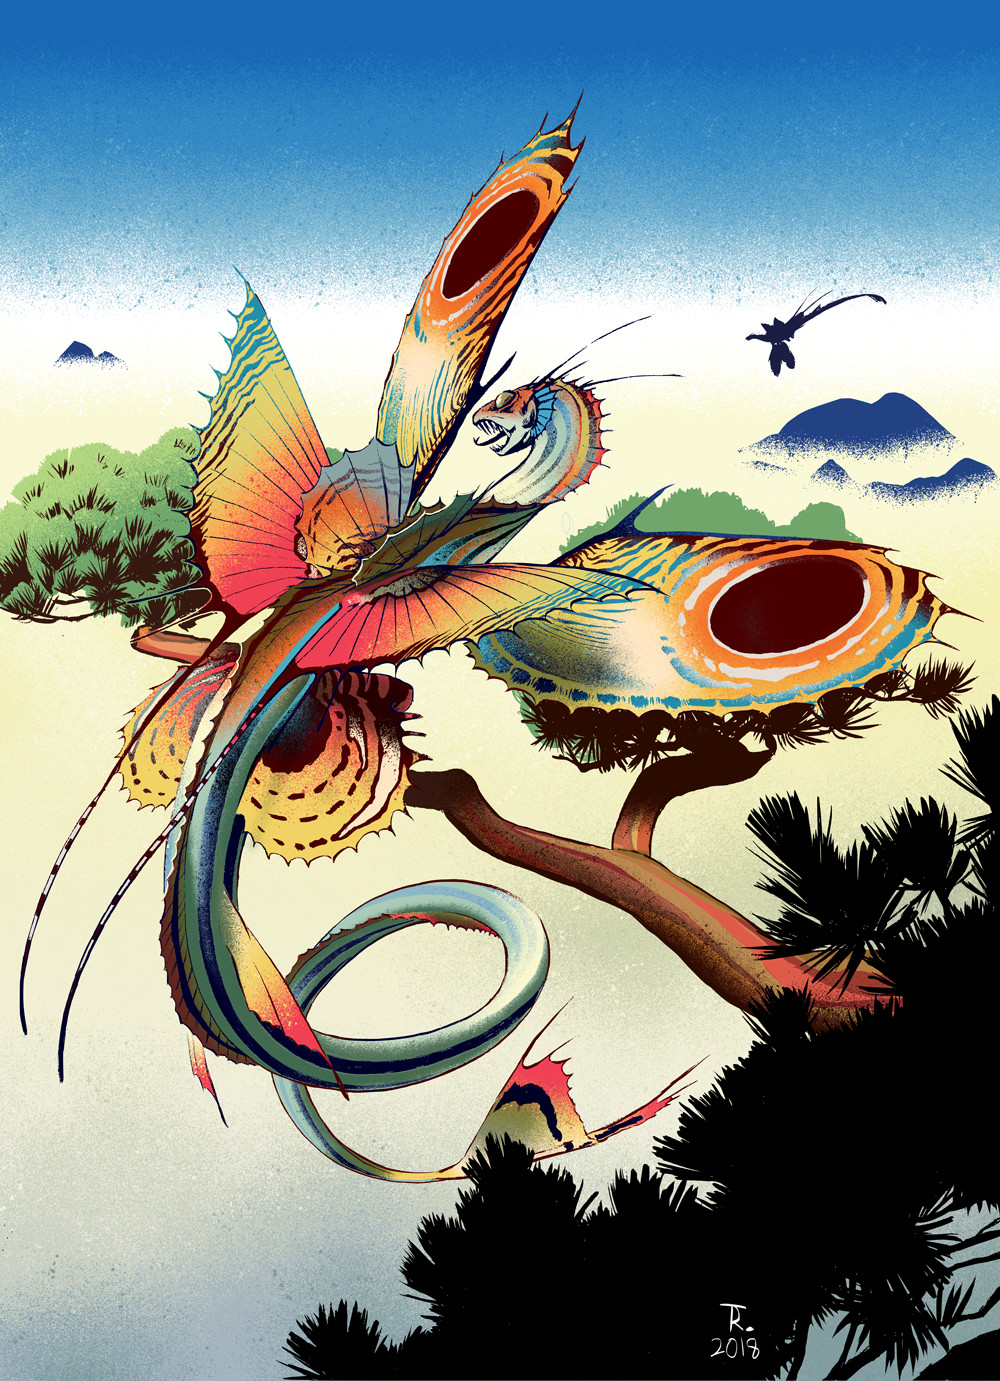 Tinctorium manicthe dragon